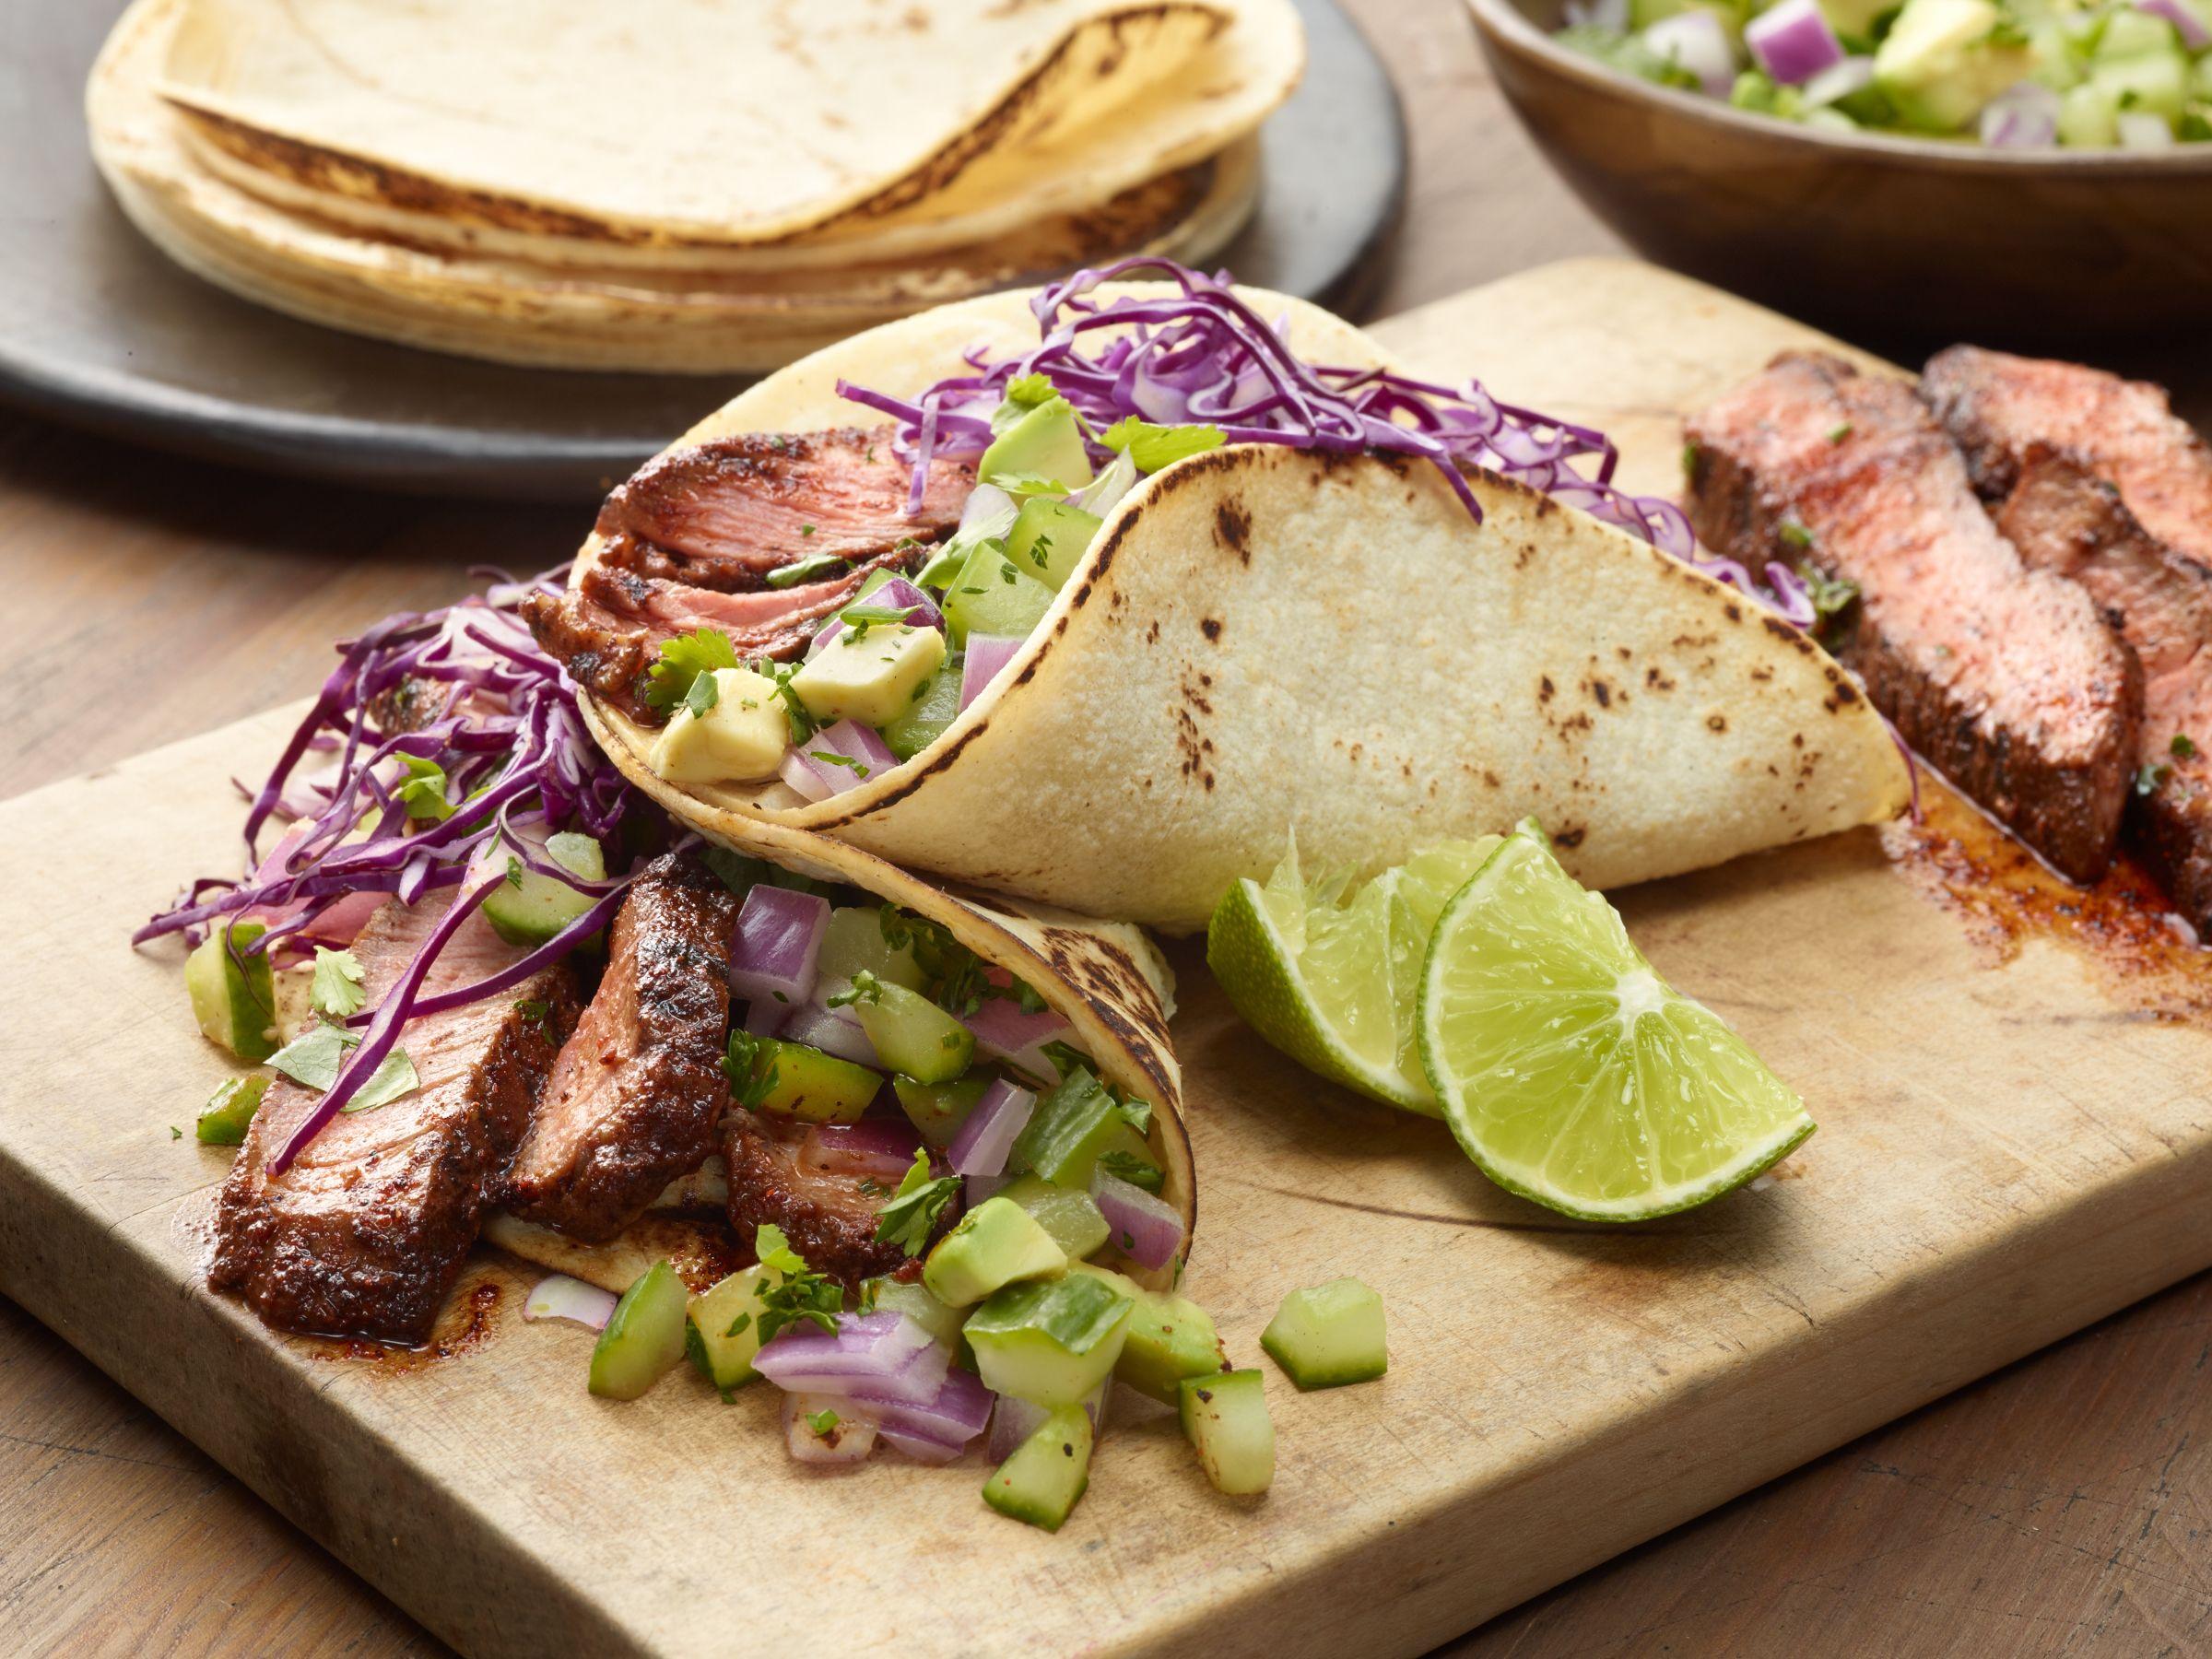 Chili Rubbed Steak Tacos Recipe Food Network Recipes Healthy Mexican Recipes Recipes